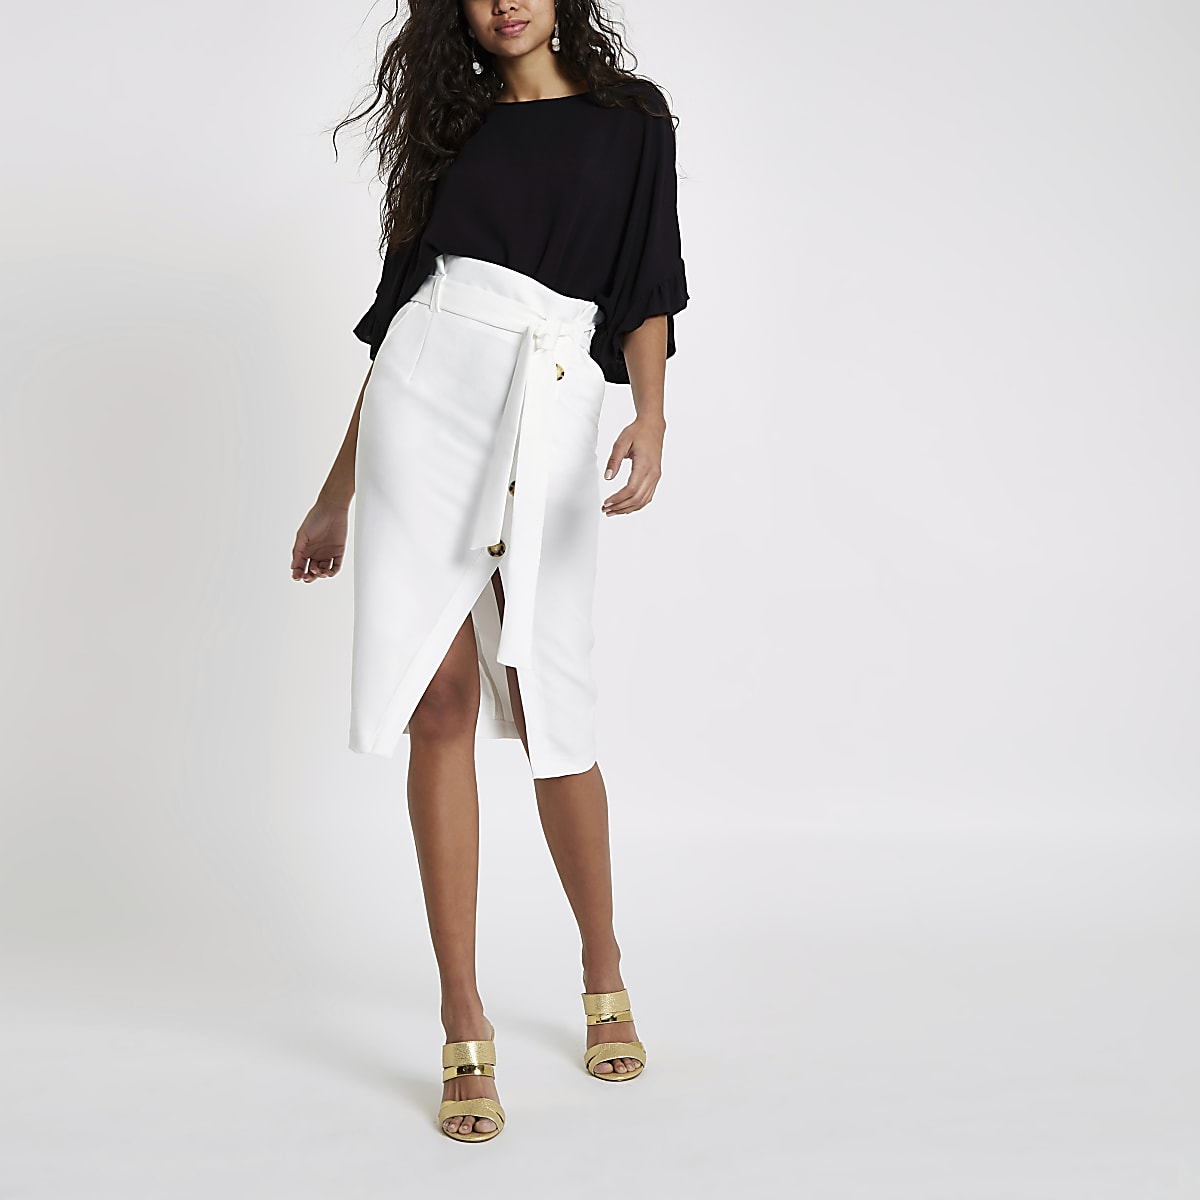 928b2bc8e2 White paperbag button front pencil skirt - Midi Skirts - Skirts - women